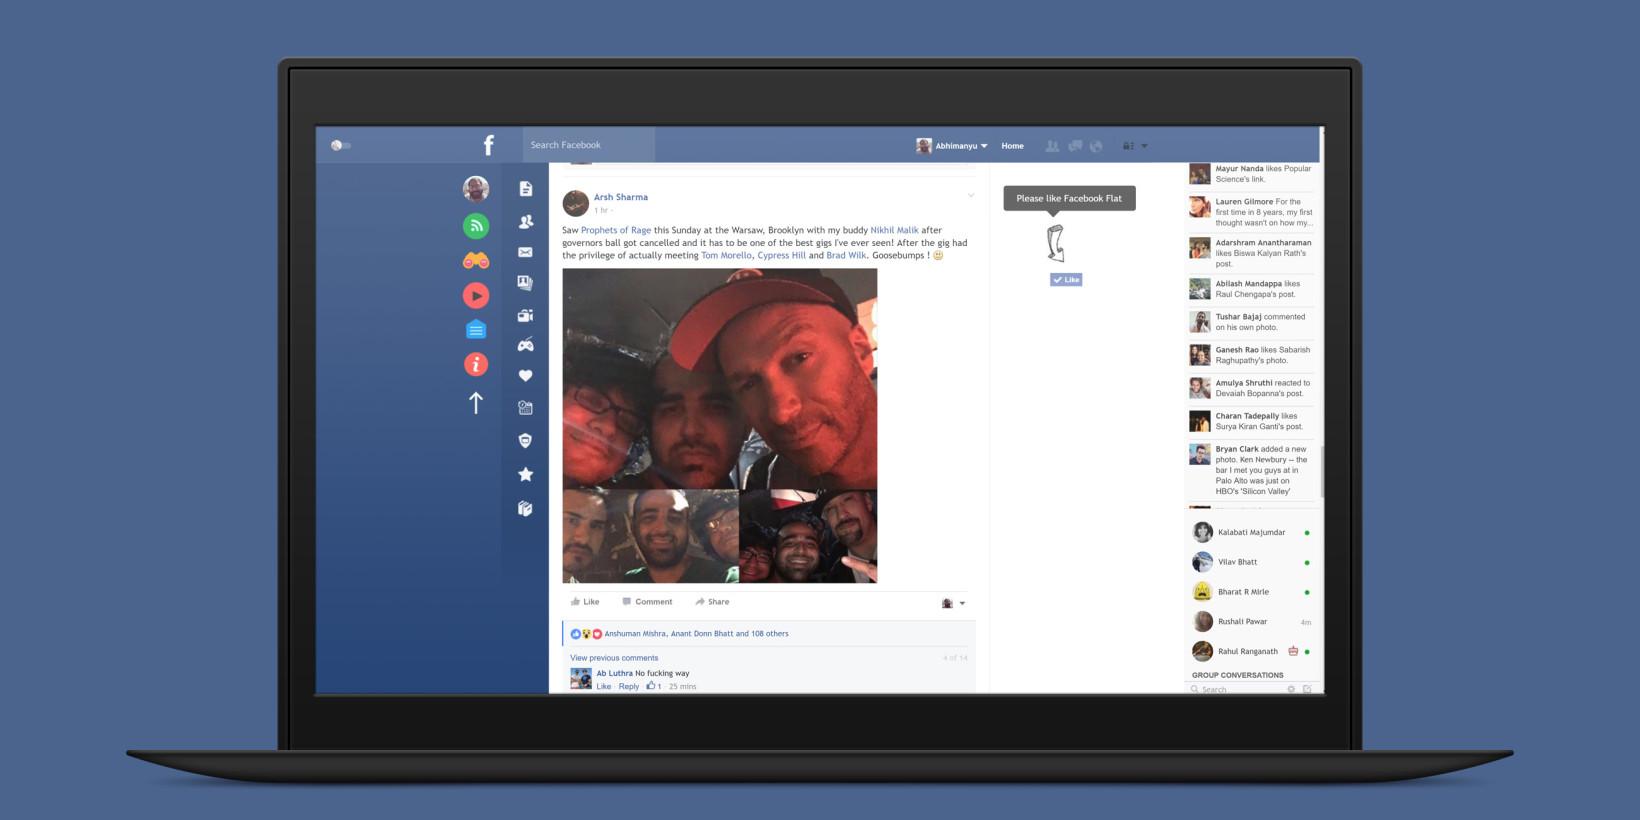 Flatbook for Chrome cleans up Facebook's messy desktop UI